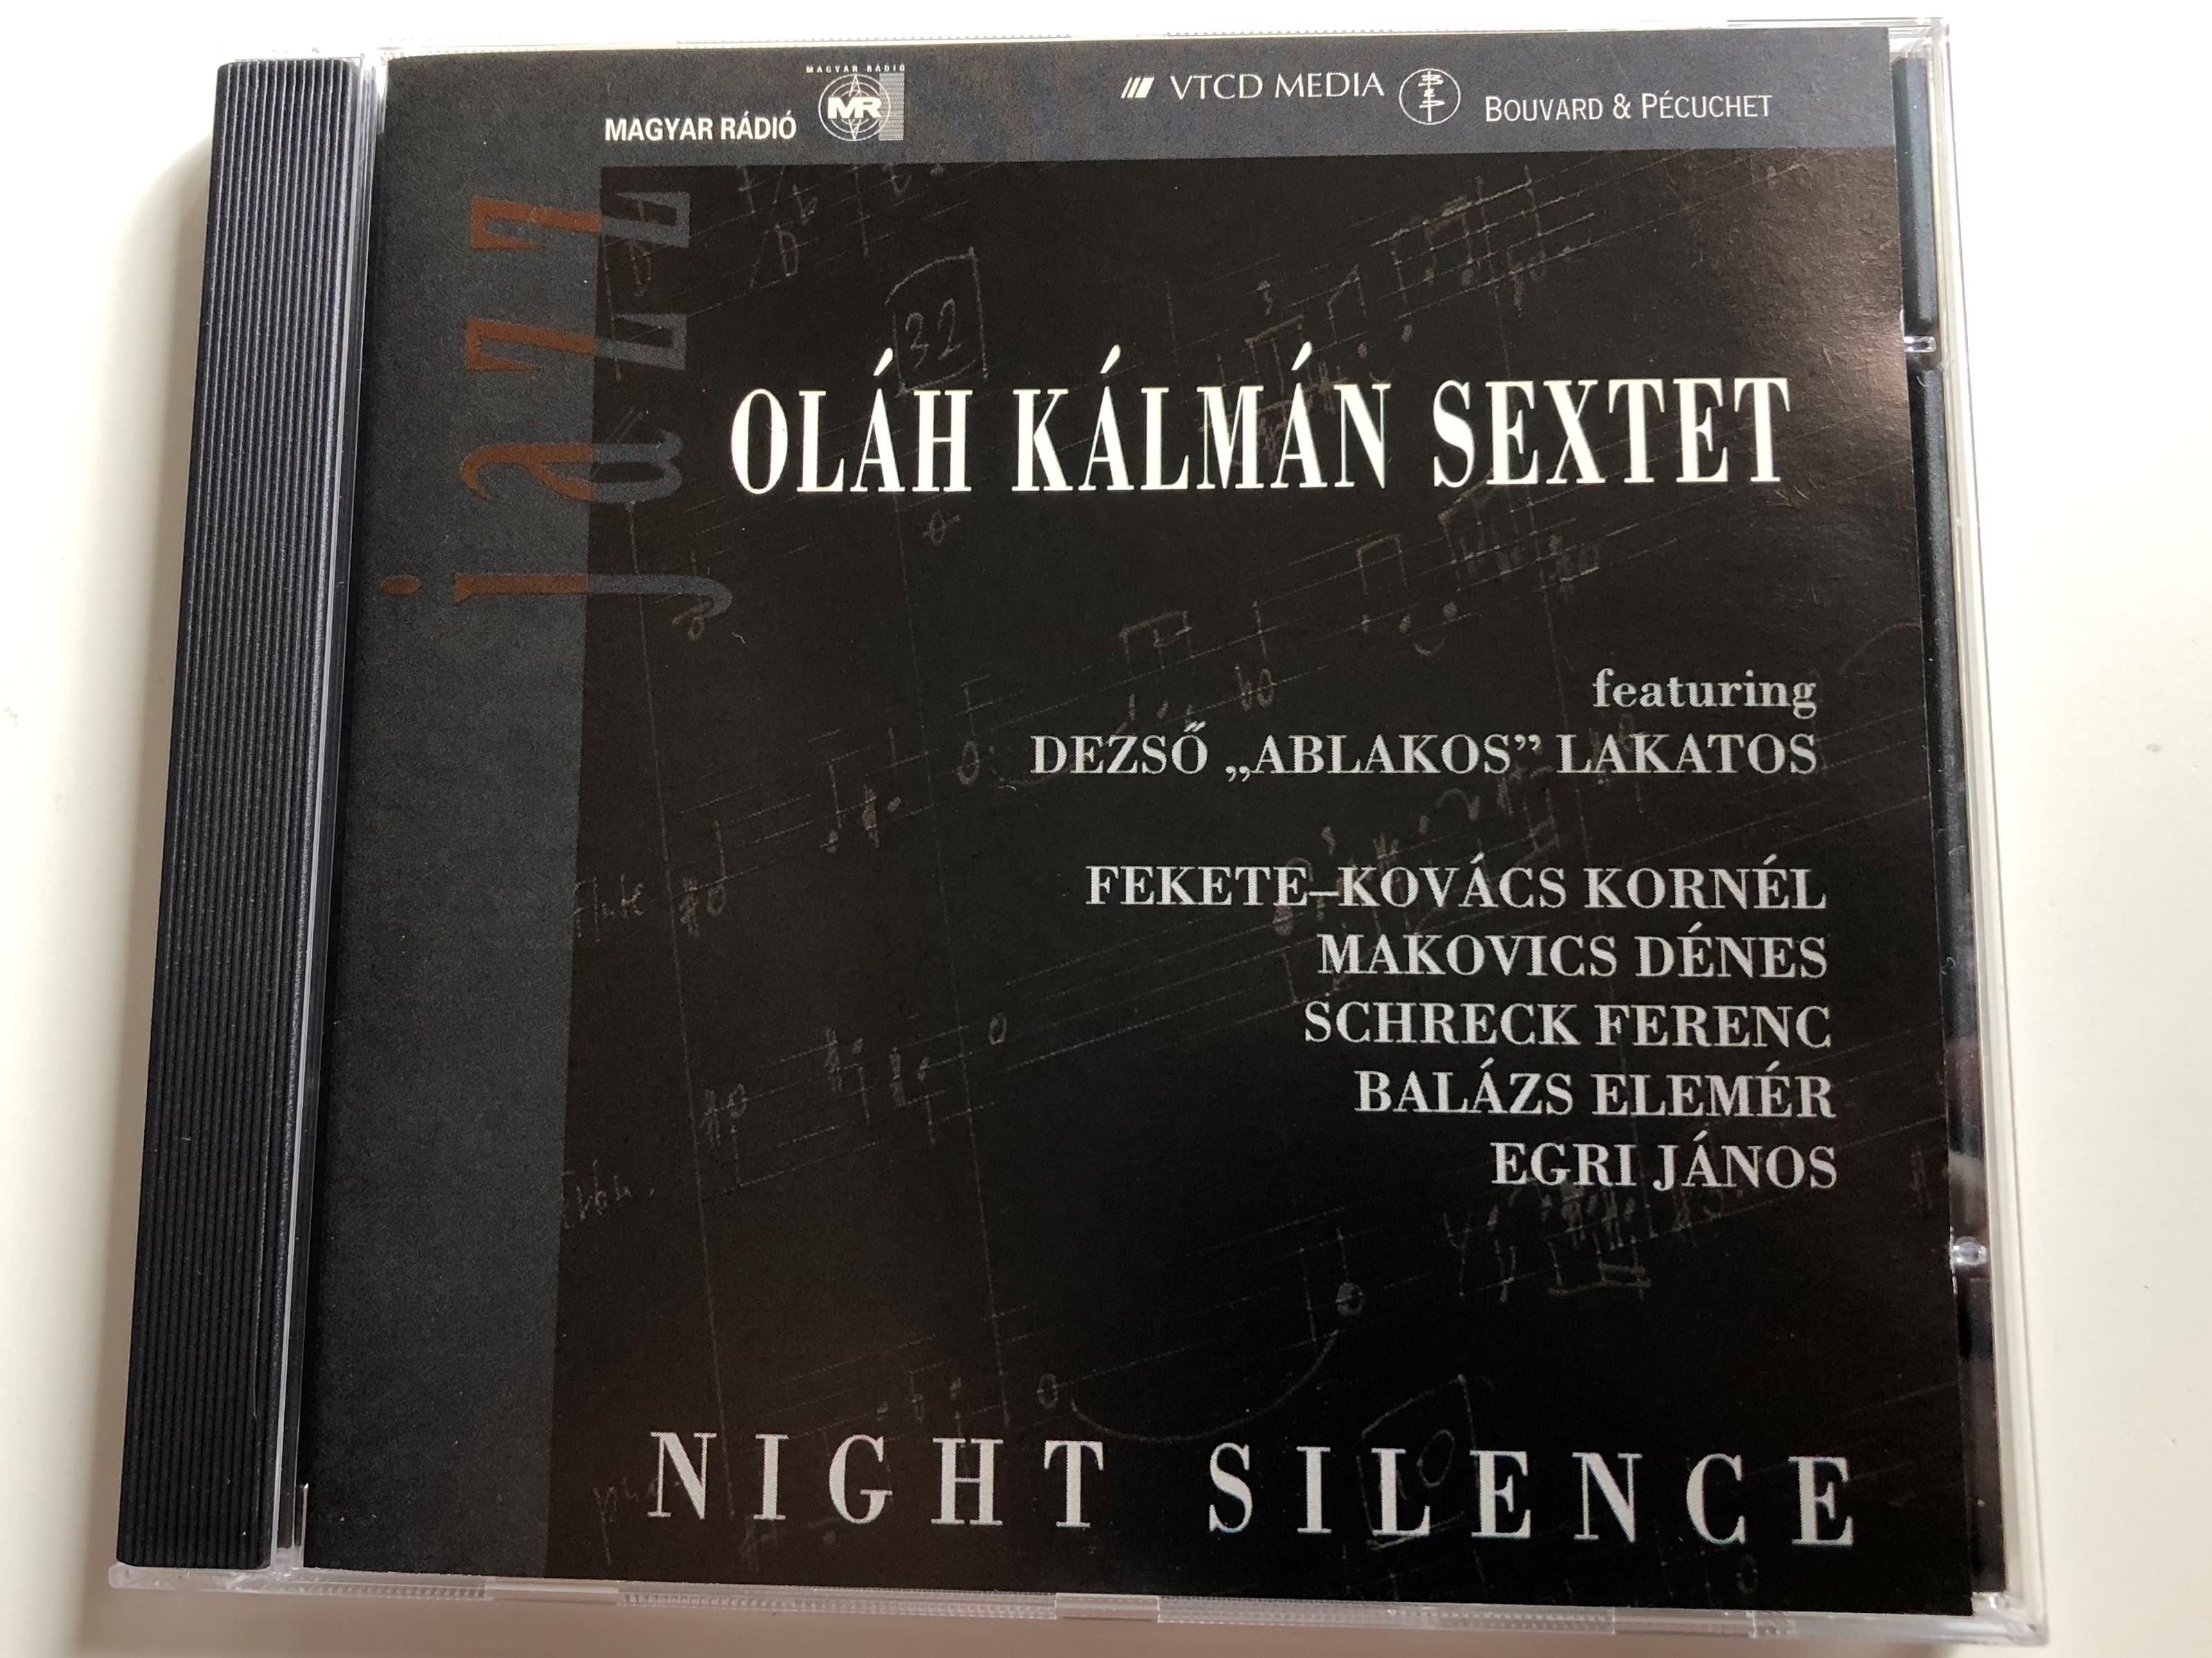 ol-h-k-lm-n-sextet-night-silence-featuring-dezso-ablakos-lakatos-feket-kovacs-kornel-makovics-denes-schreck-ferenc-balazs-elemer-egri-janos-bouvard-p-cuchet-records-audio-cd-1995-1-.jpg